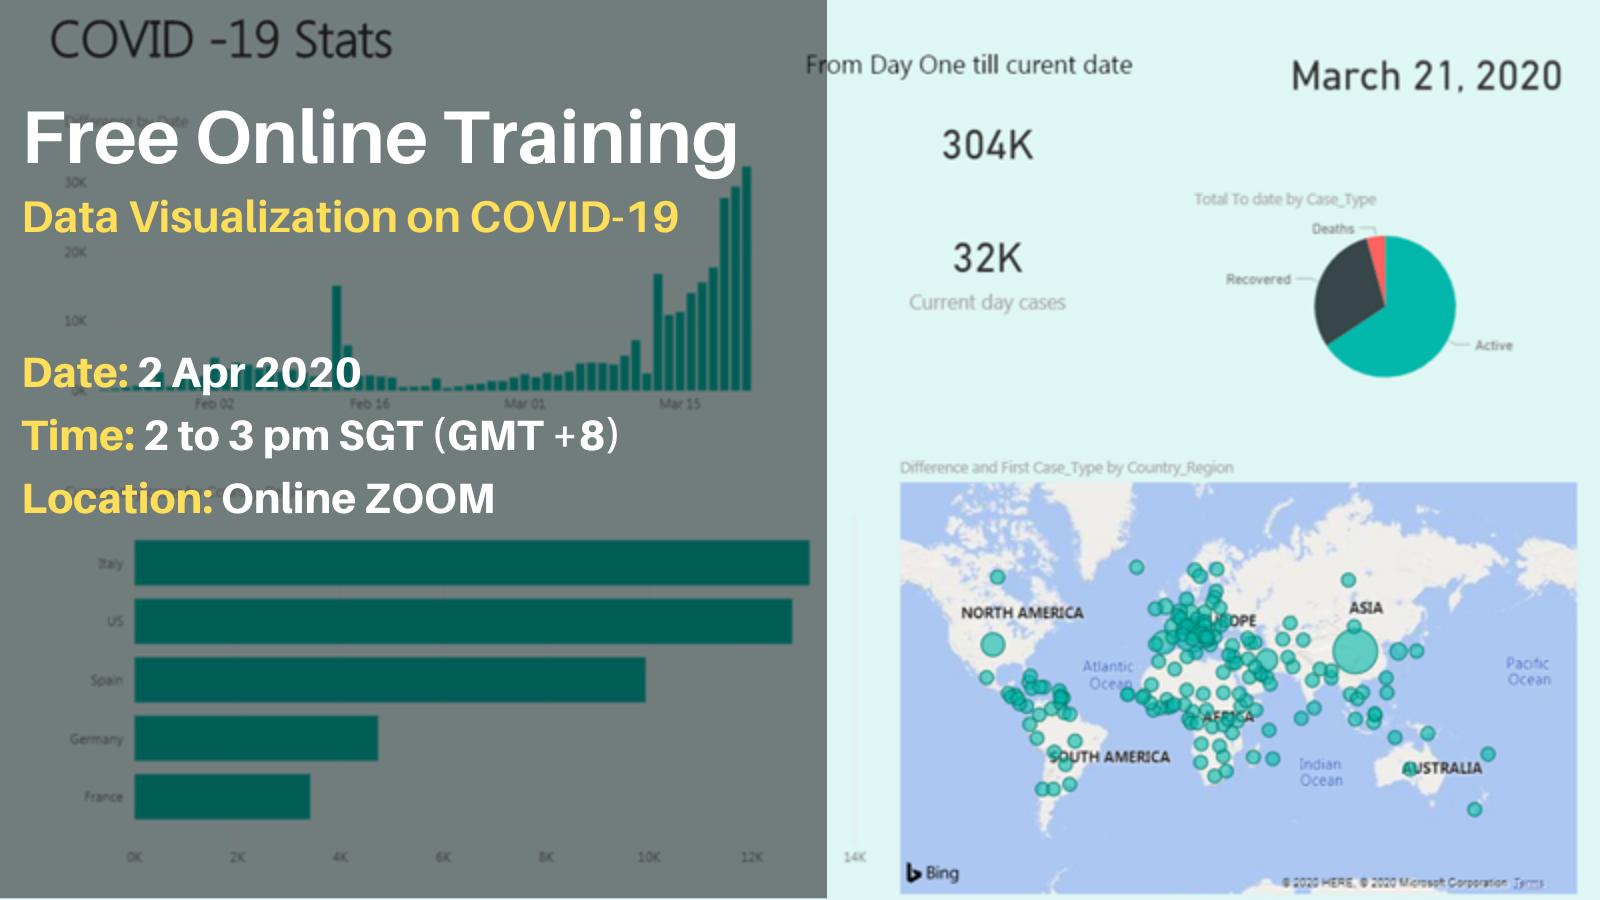 Online Training on Data Visualization